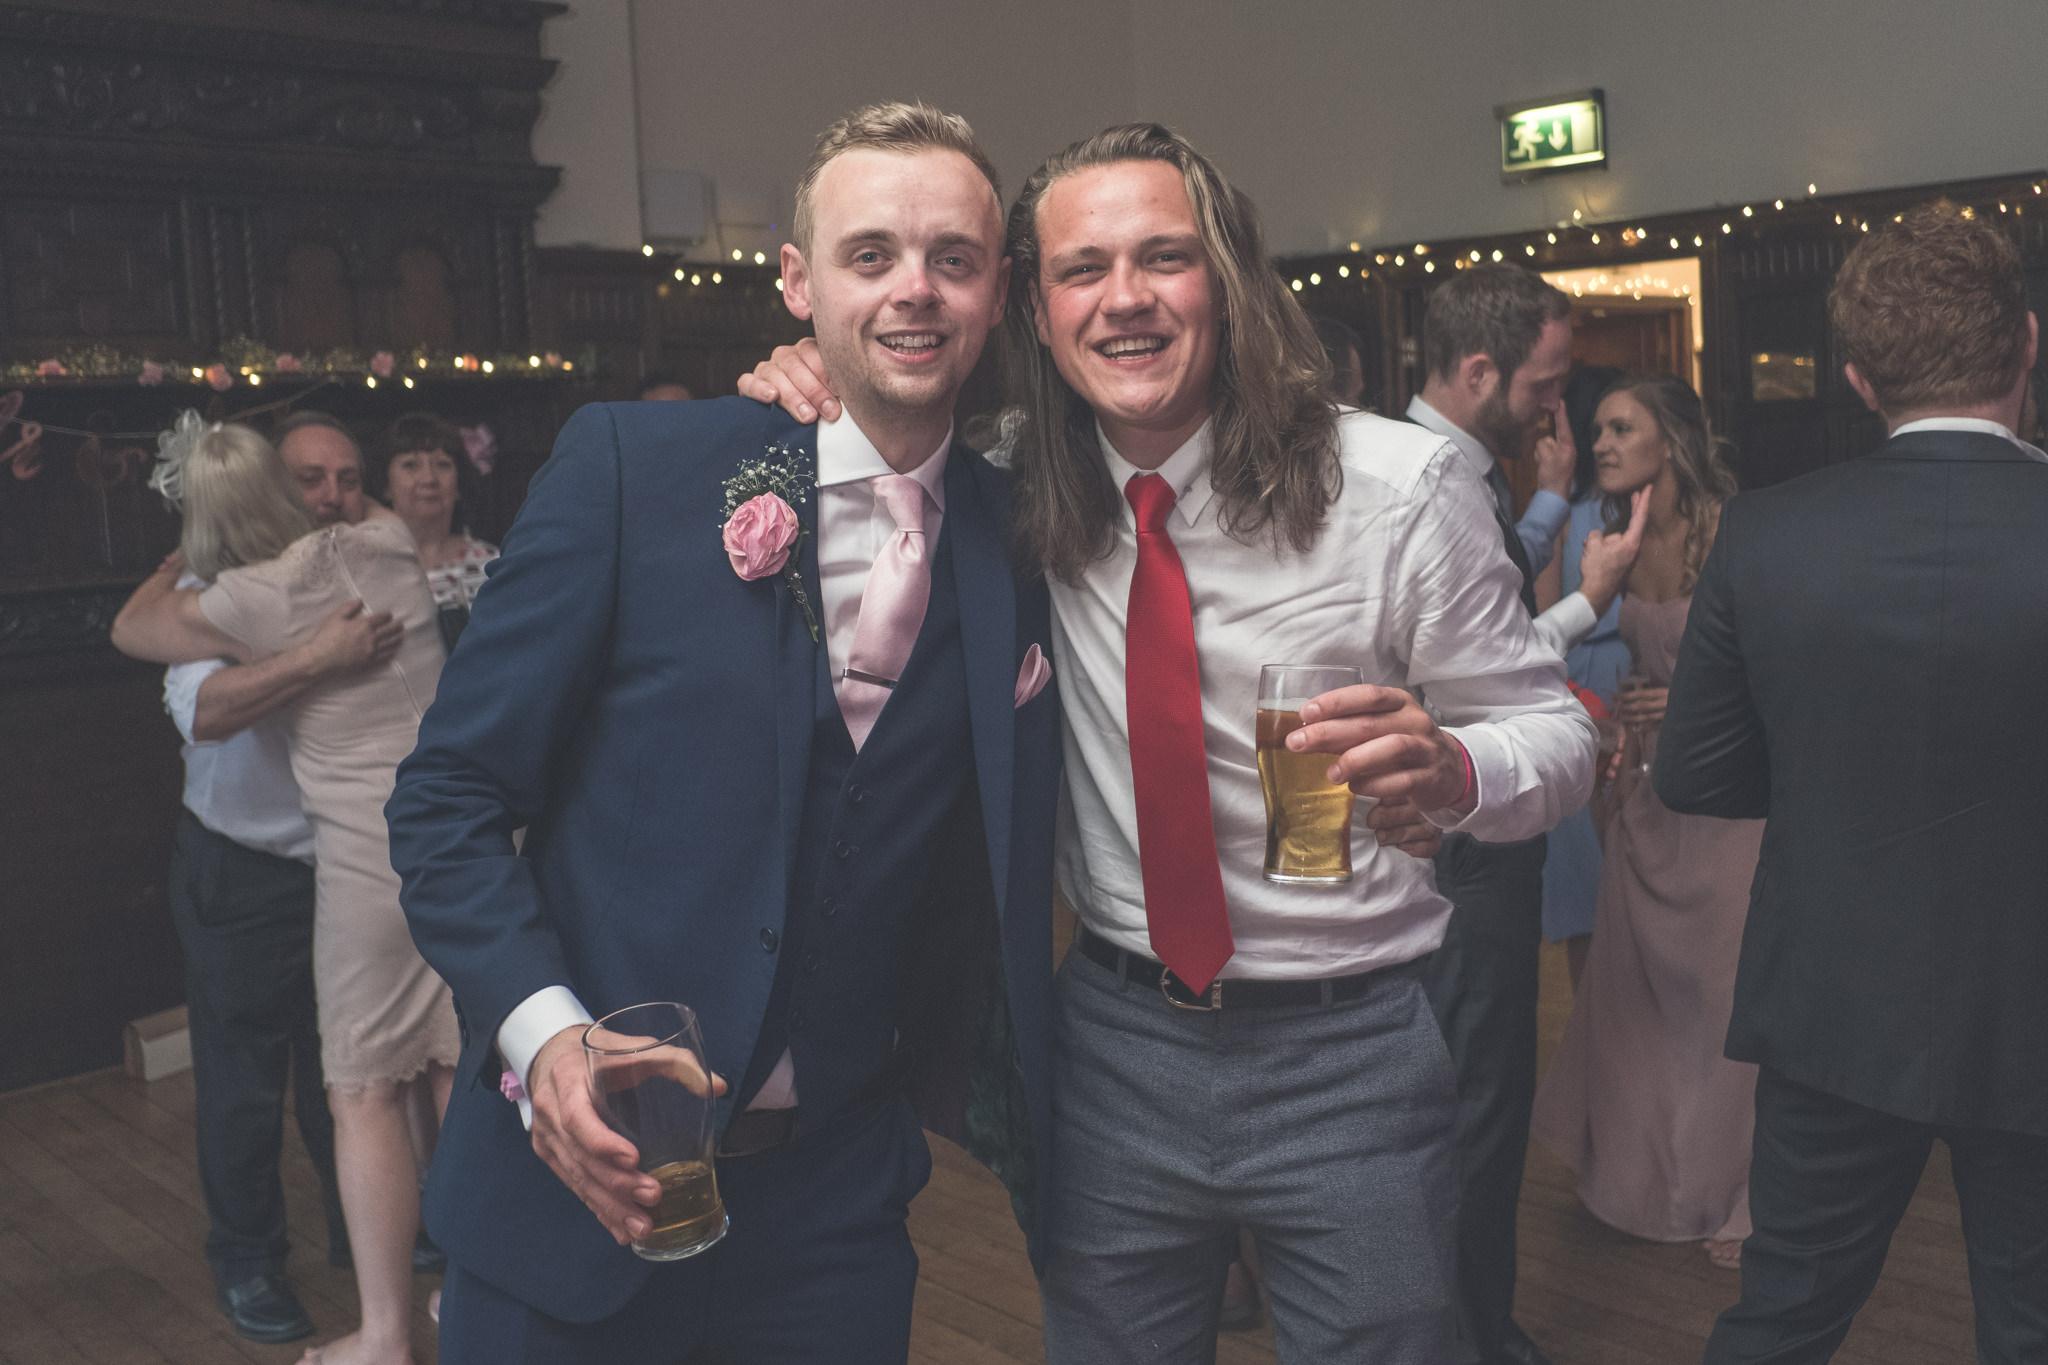 Woldingham School Wedding - Robin Ball Photography - Kate and Lee-066.jpg